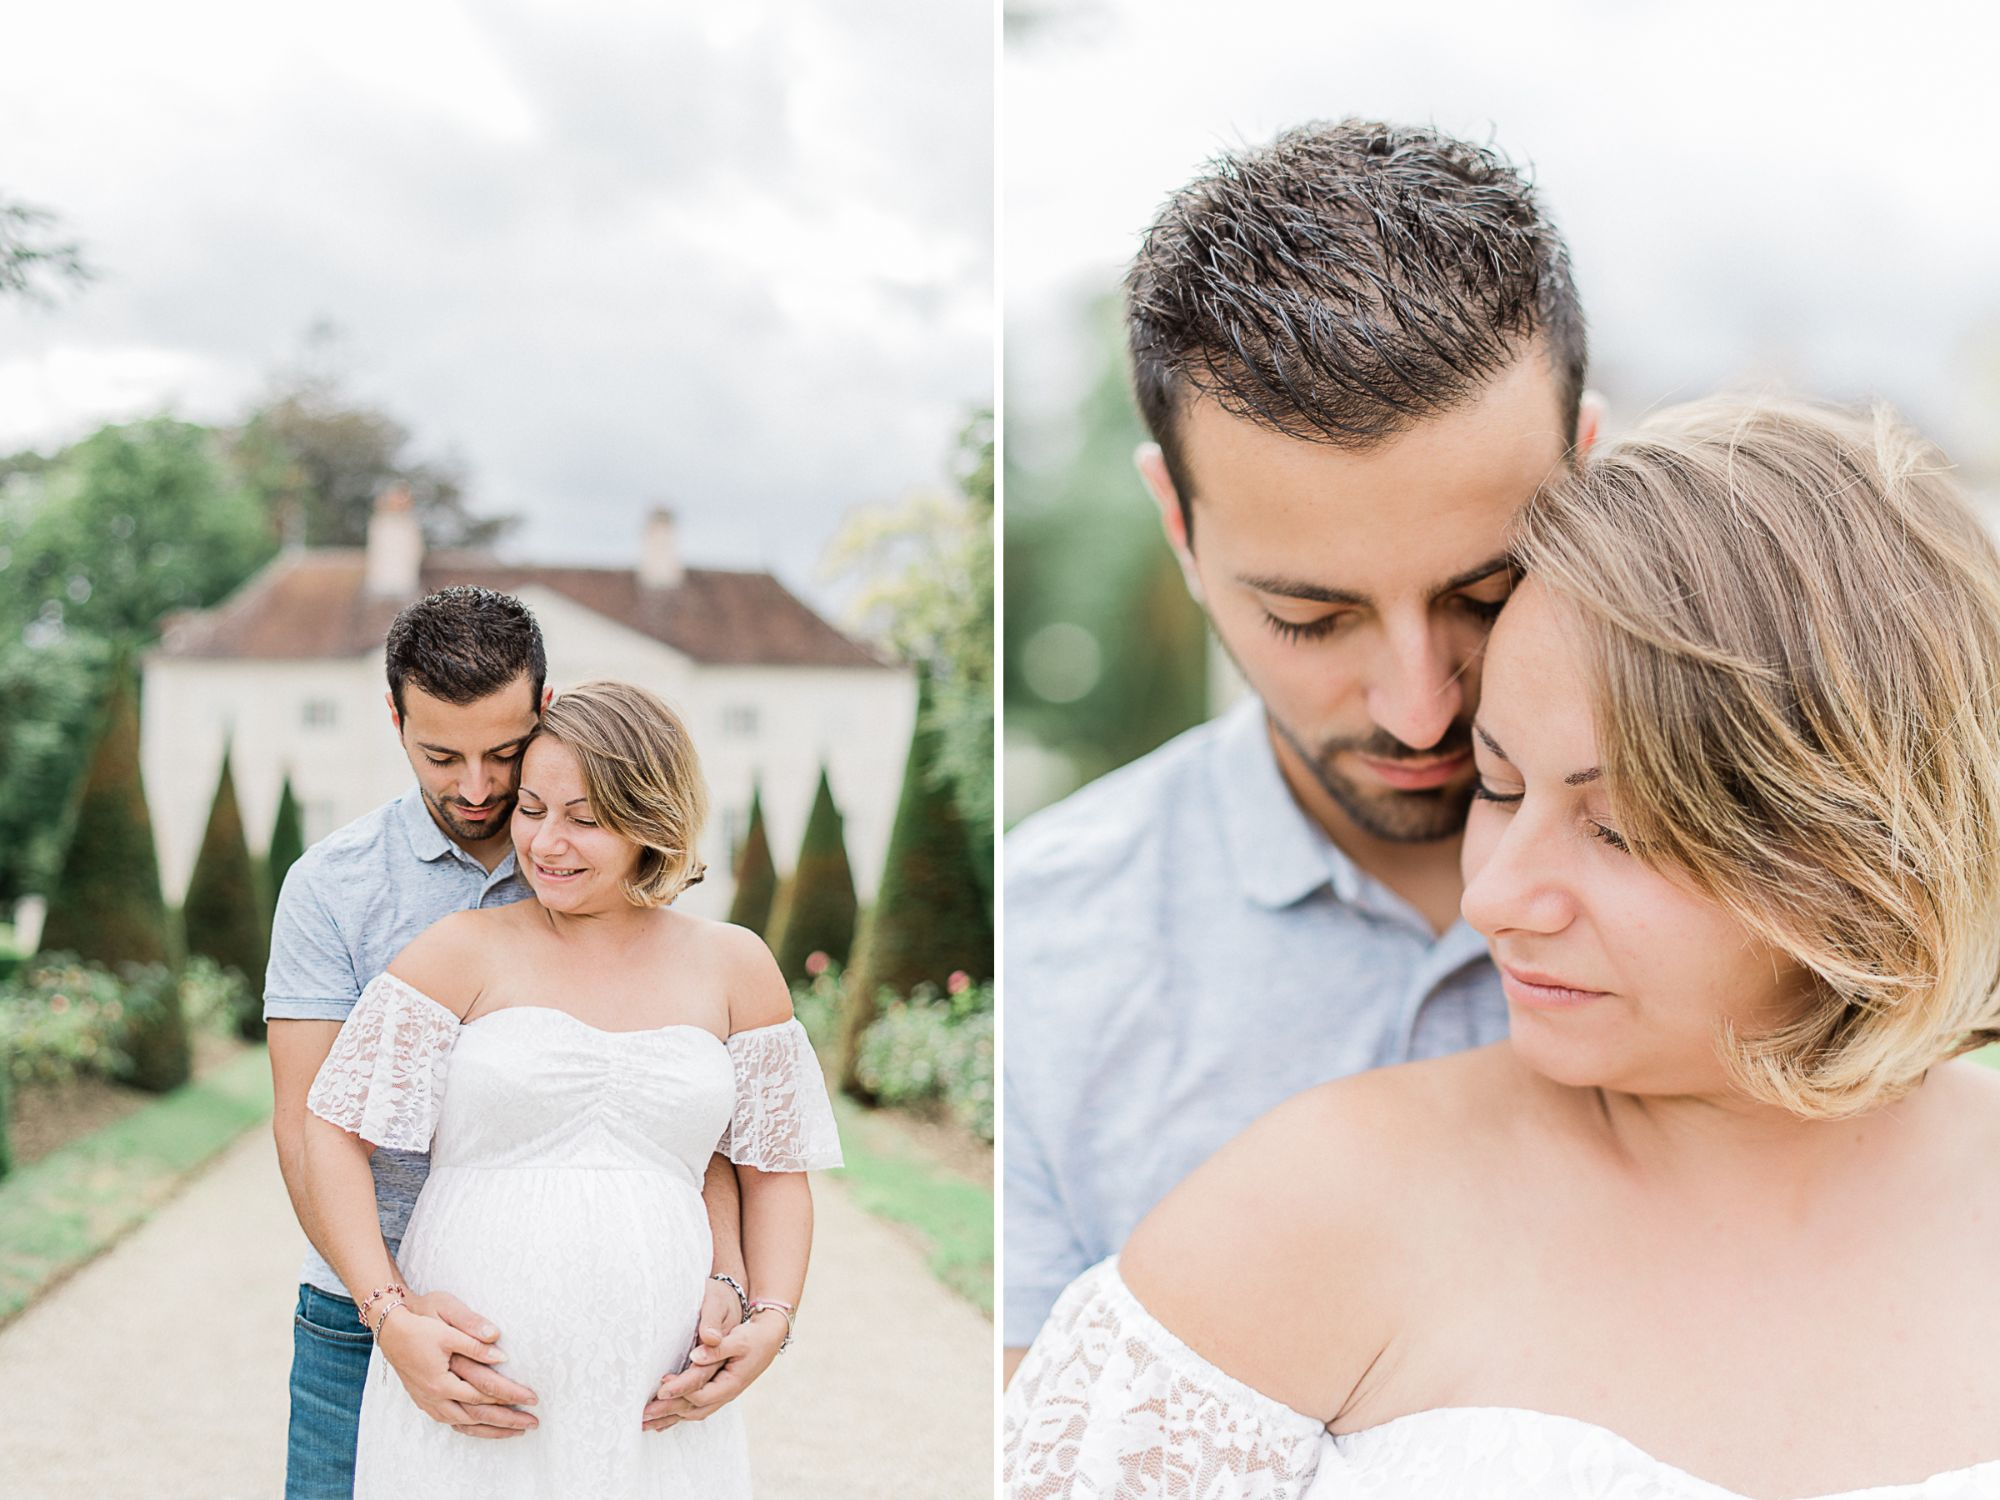 priscillapuzenat-photographe-grossesse-maternite-chablis-auxerre-yonne-bourgogne